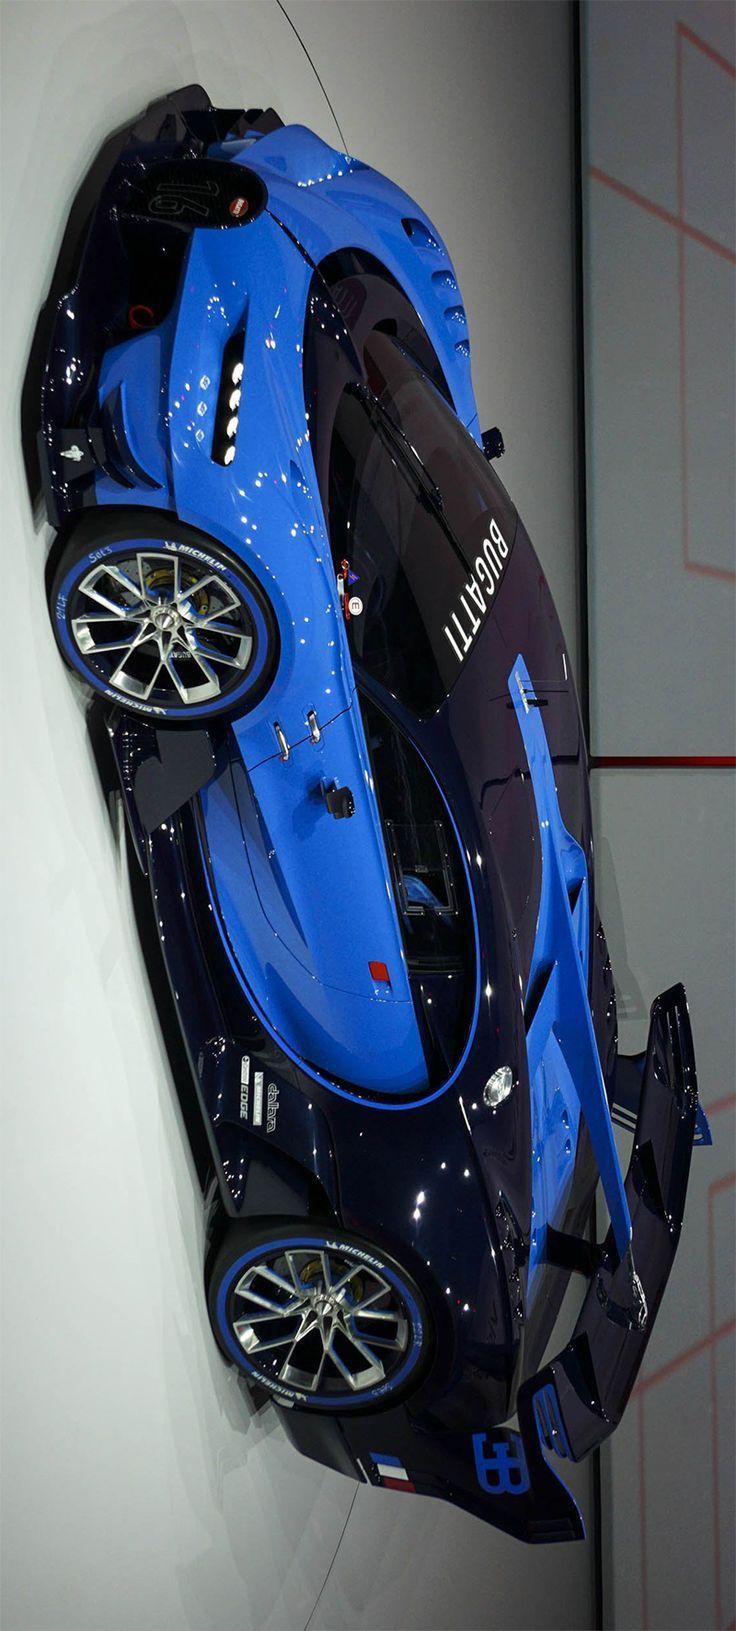 Bugatti Divo Review #Bugatti #Divo #BugattiReview #SuperCars #SportsCars